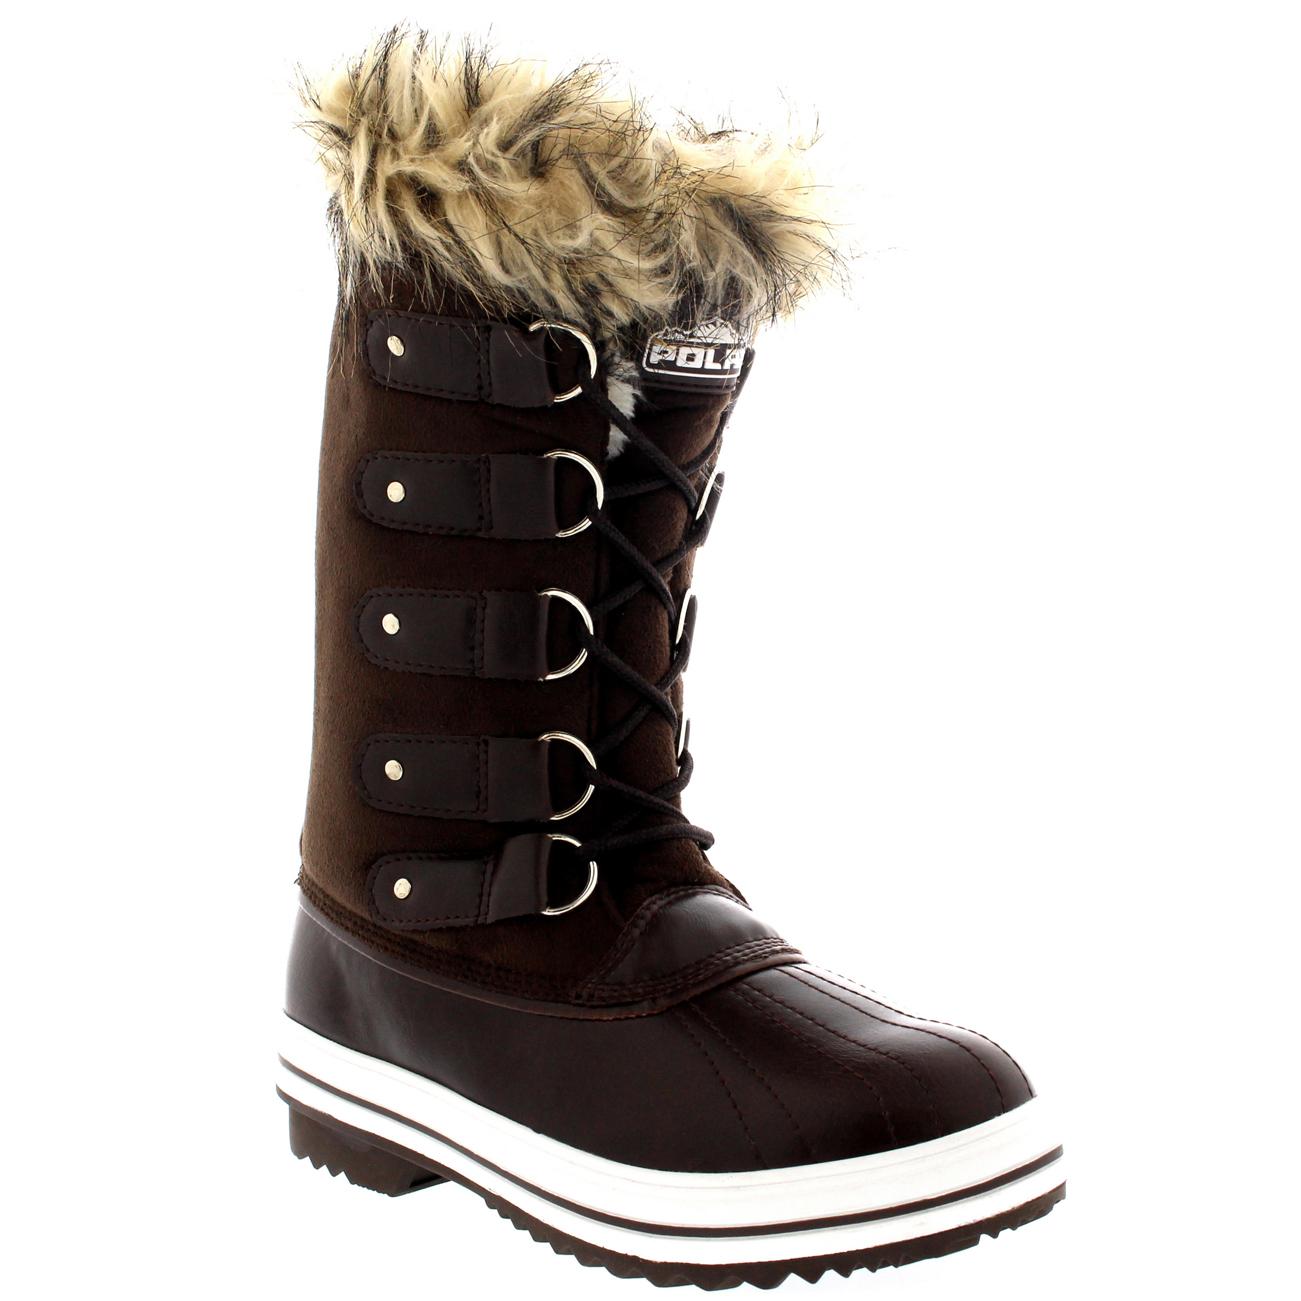 Womens Fur Cuff Lace Up Rubber Sole Tall Winter Snow Rain